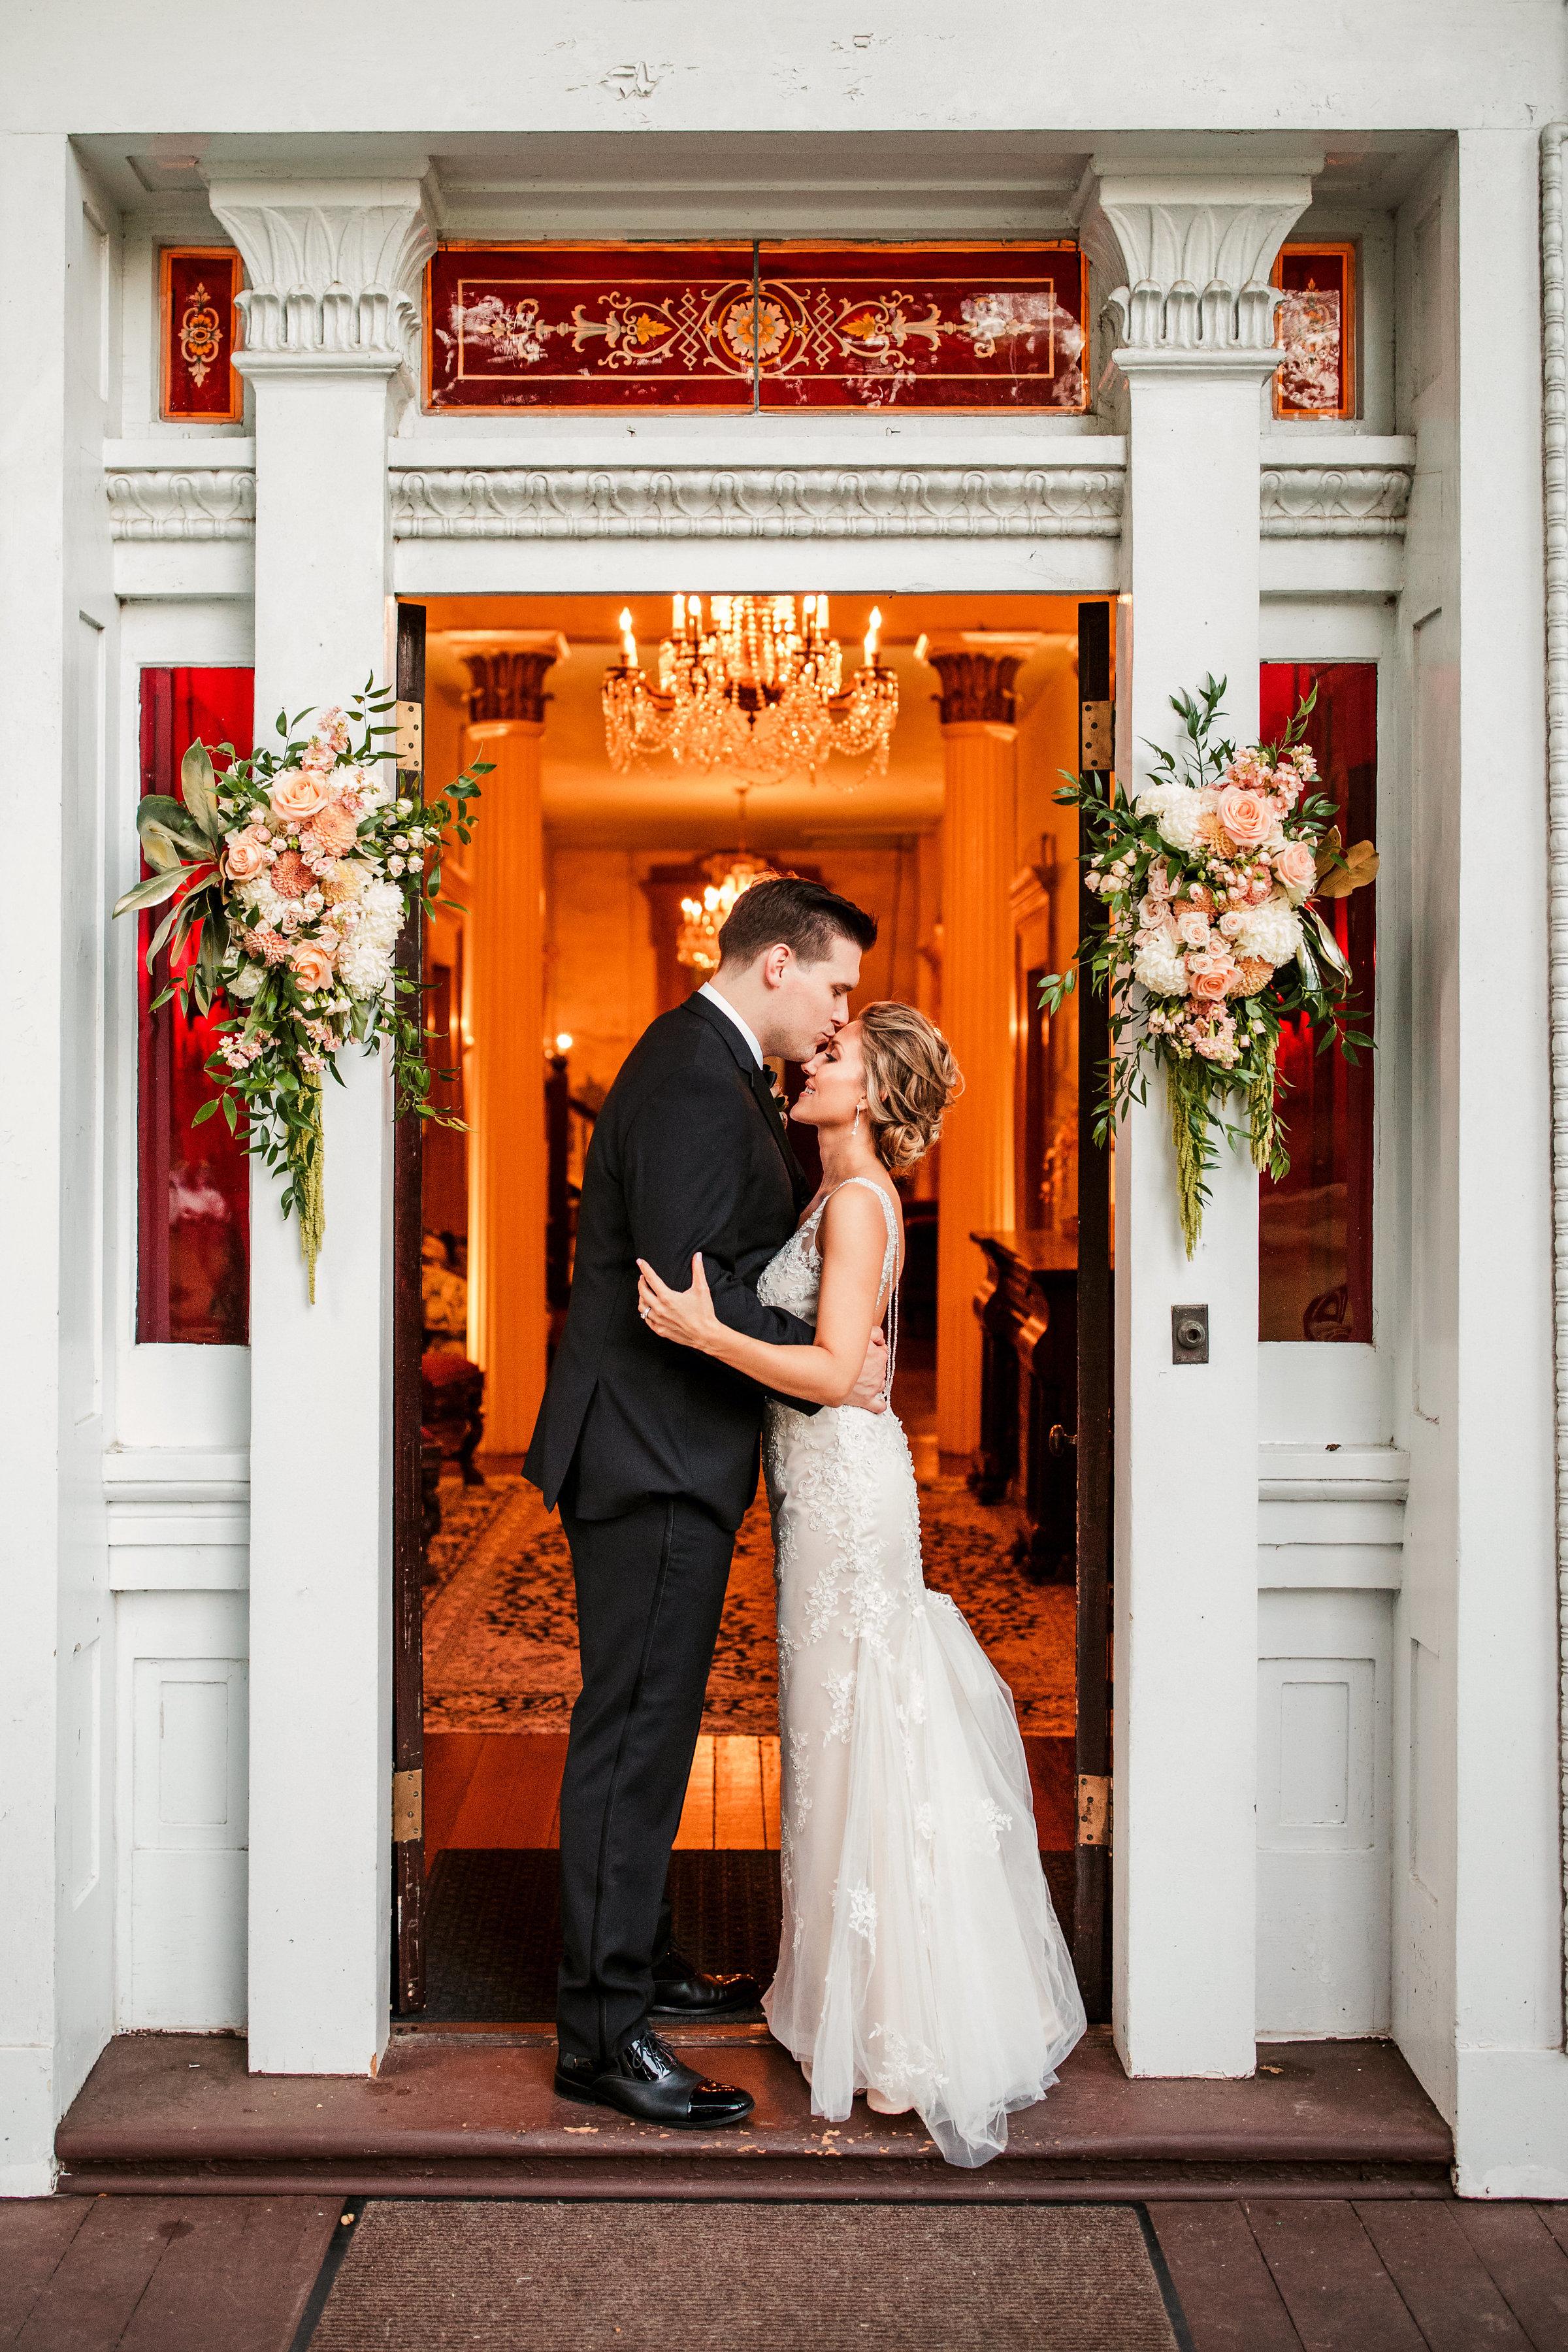 Riverwood-Mansion-Wedding26.jpg